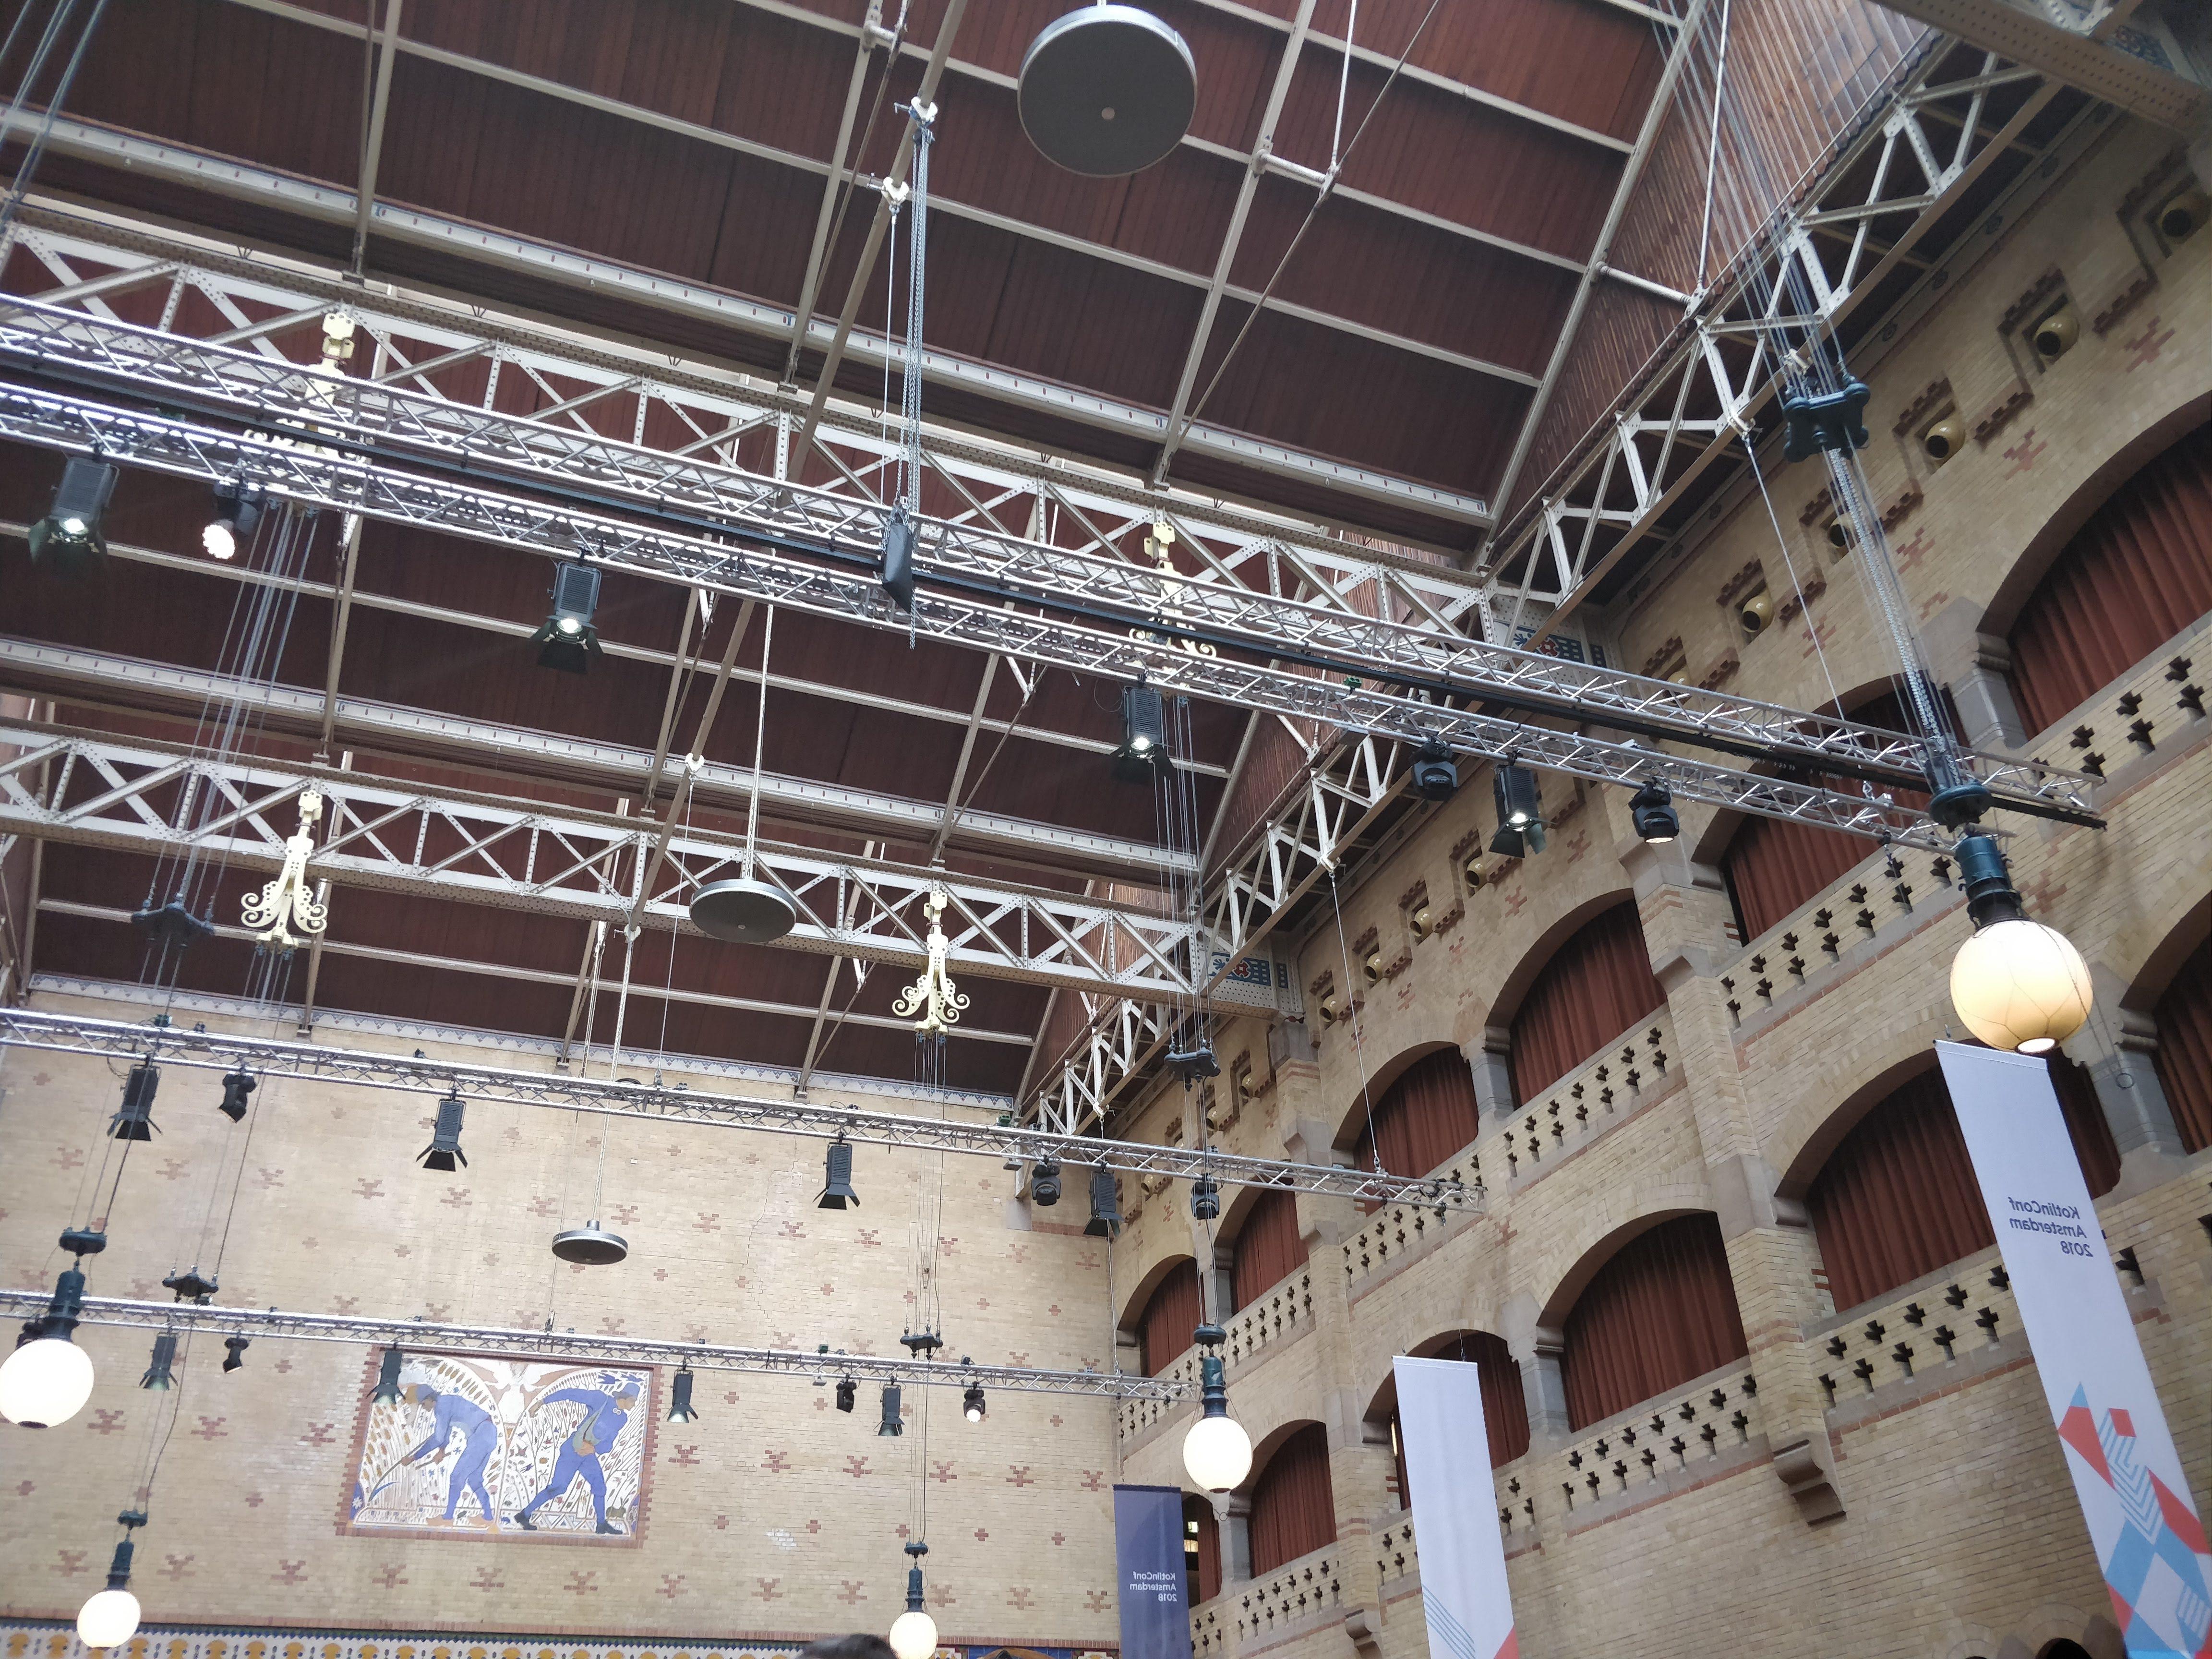 Inside the Beurs Van Berlage